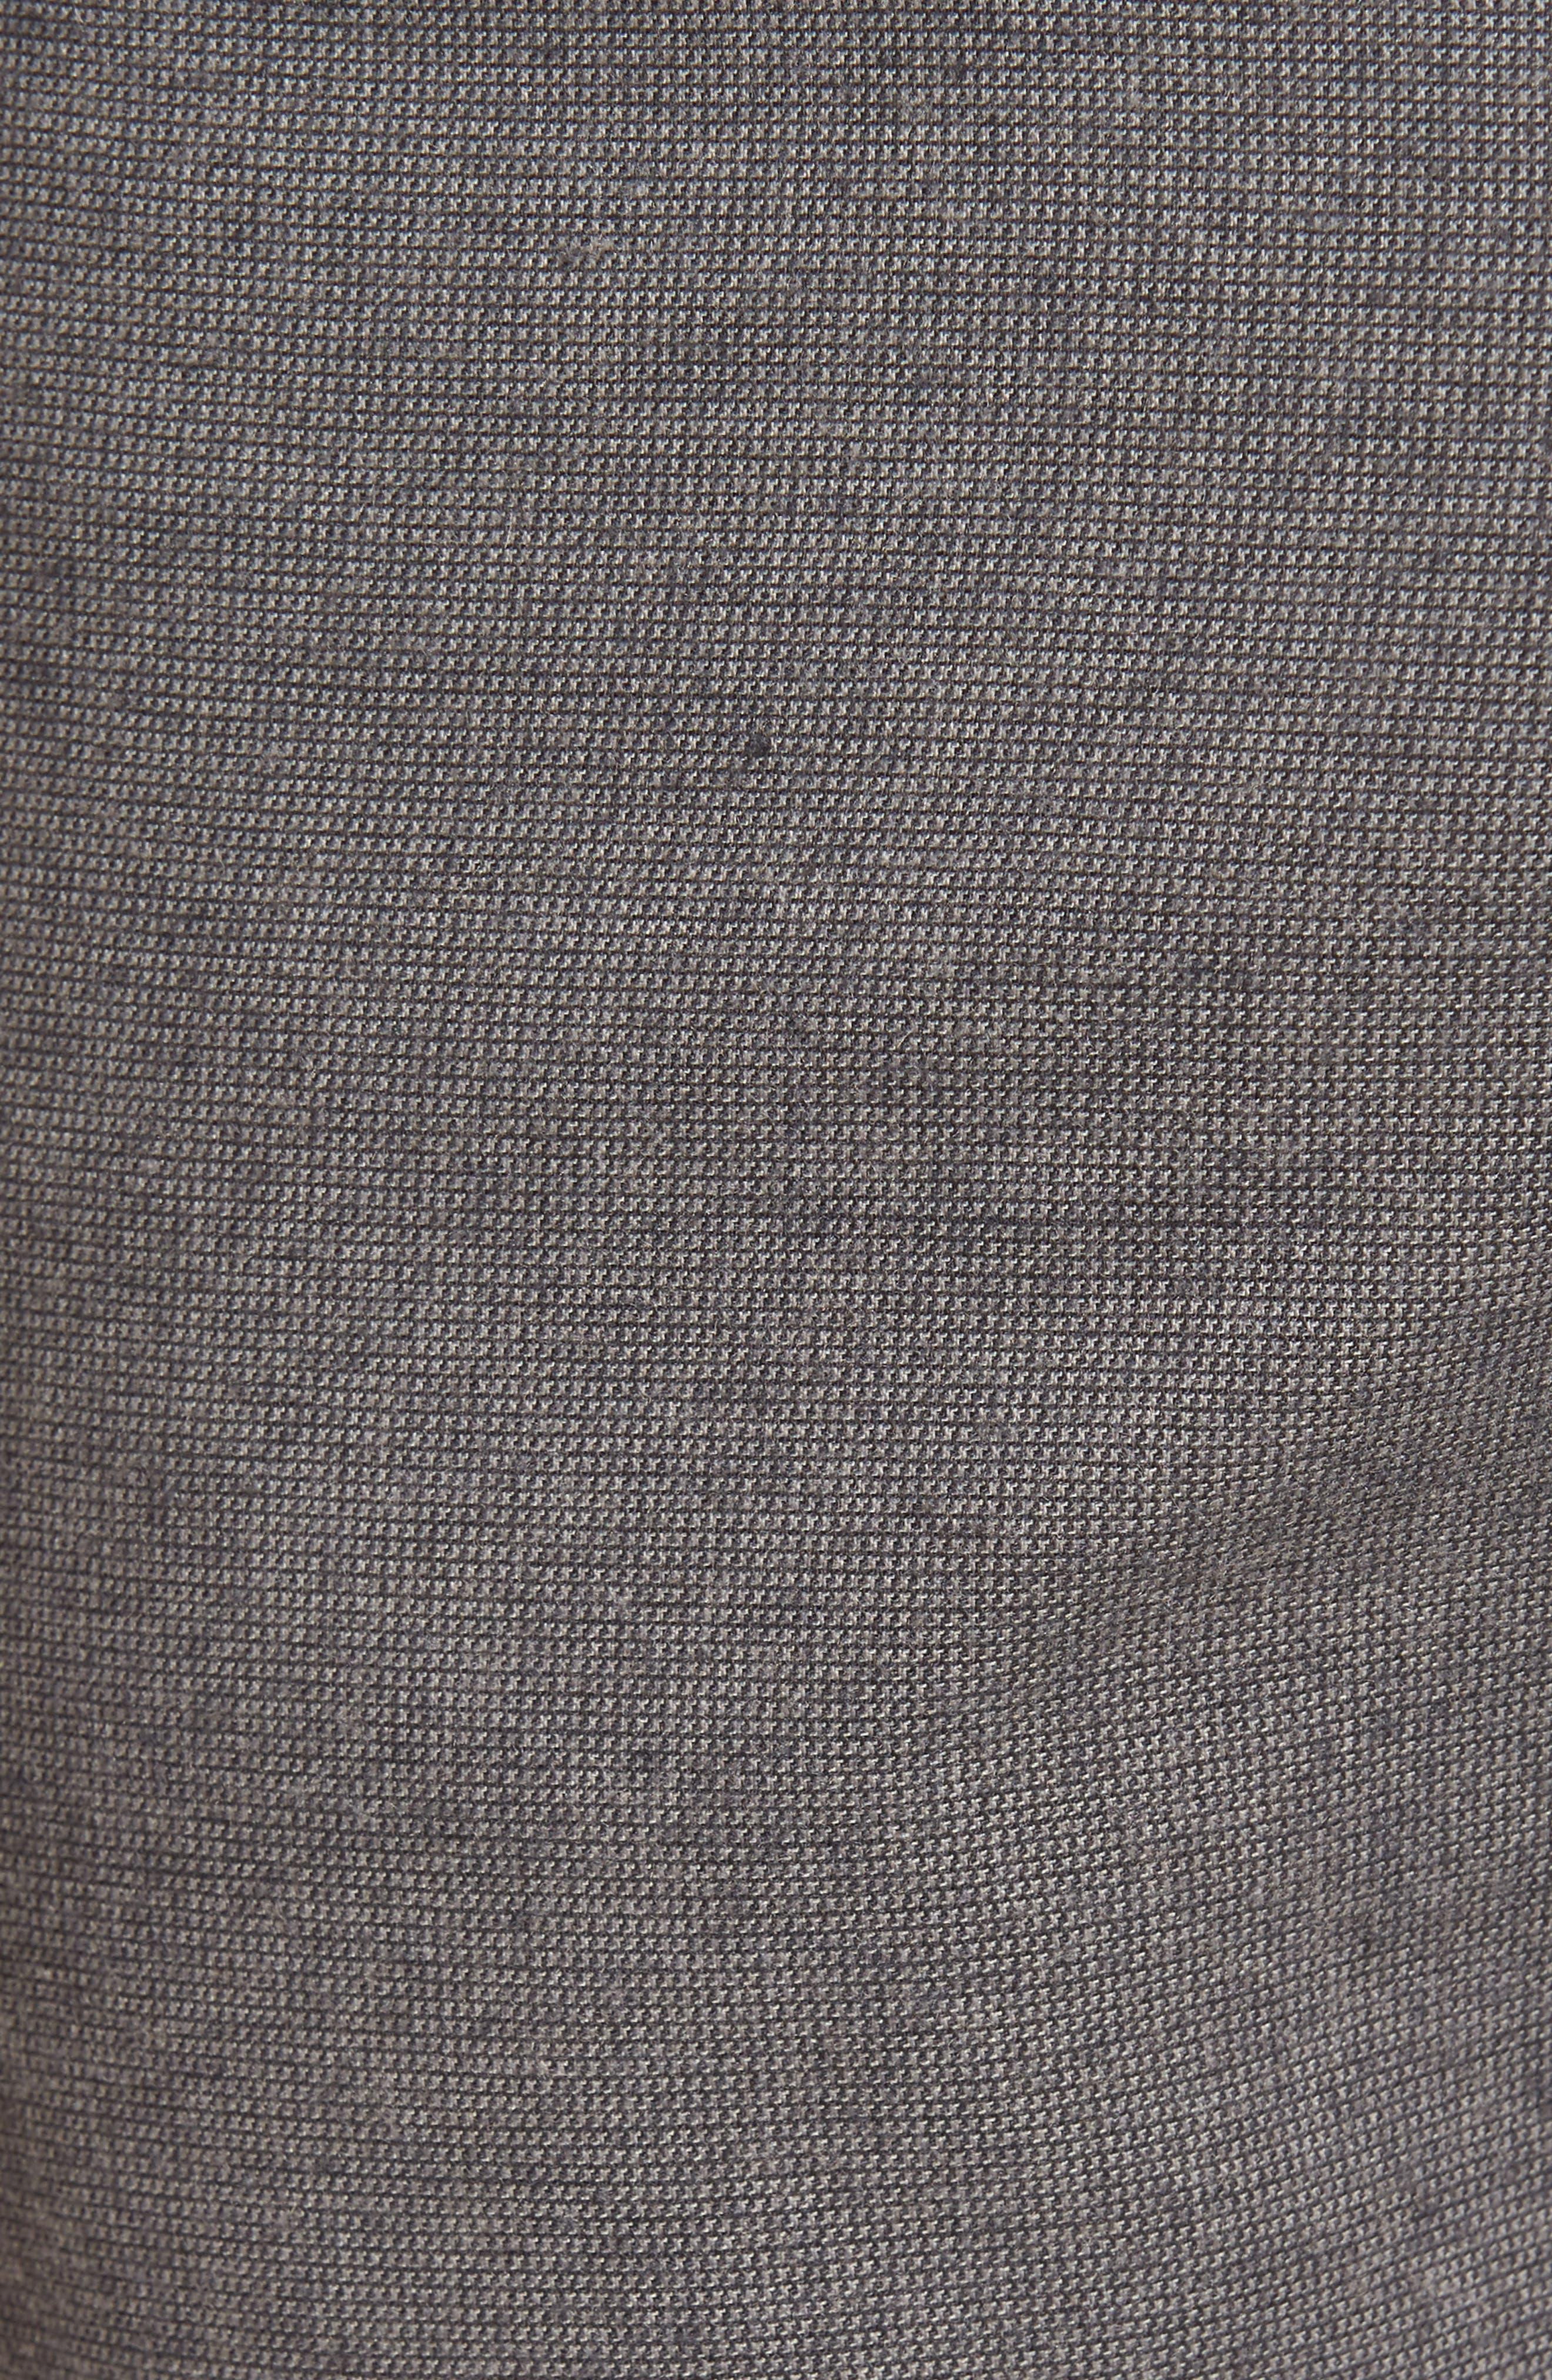 Five-Pocket Stretch Cotton Trousers,                             Alternate thumbnail 23, color,